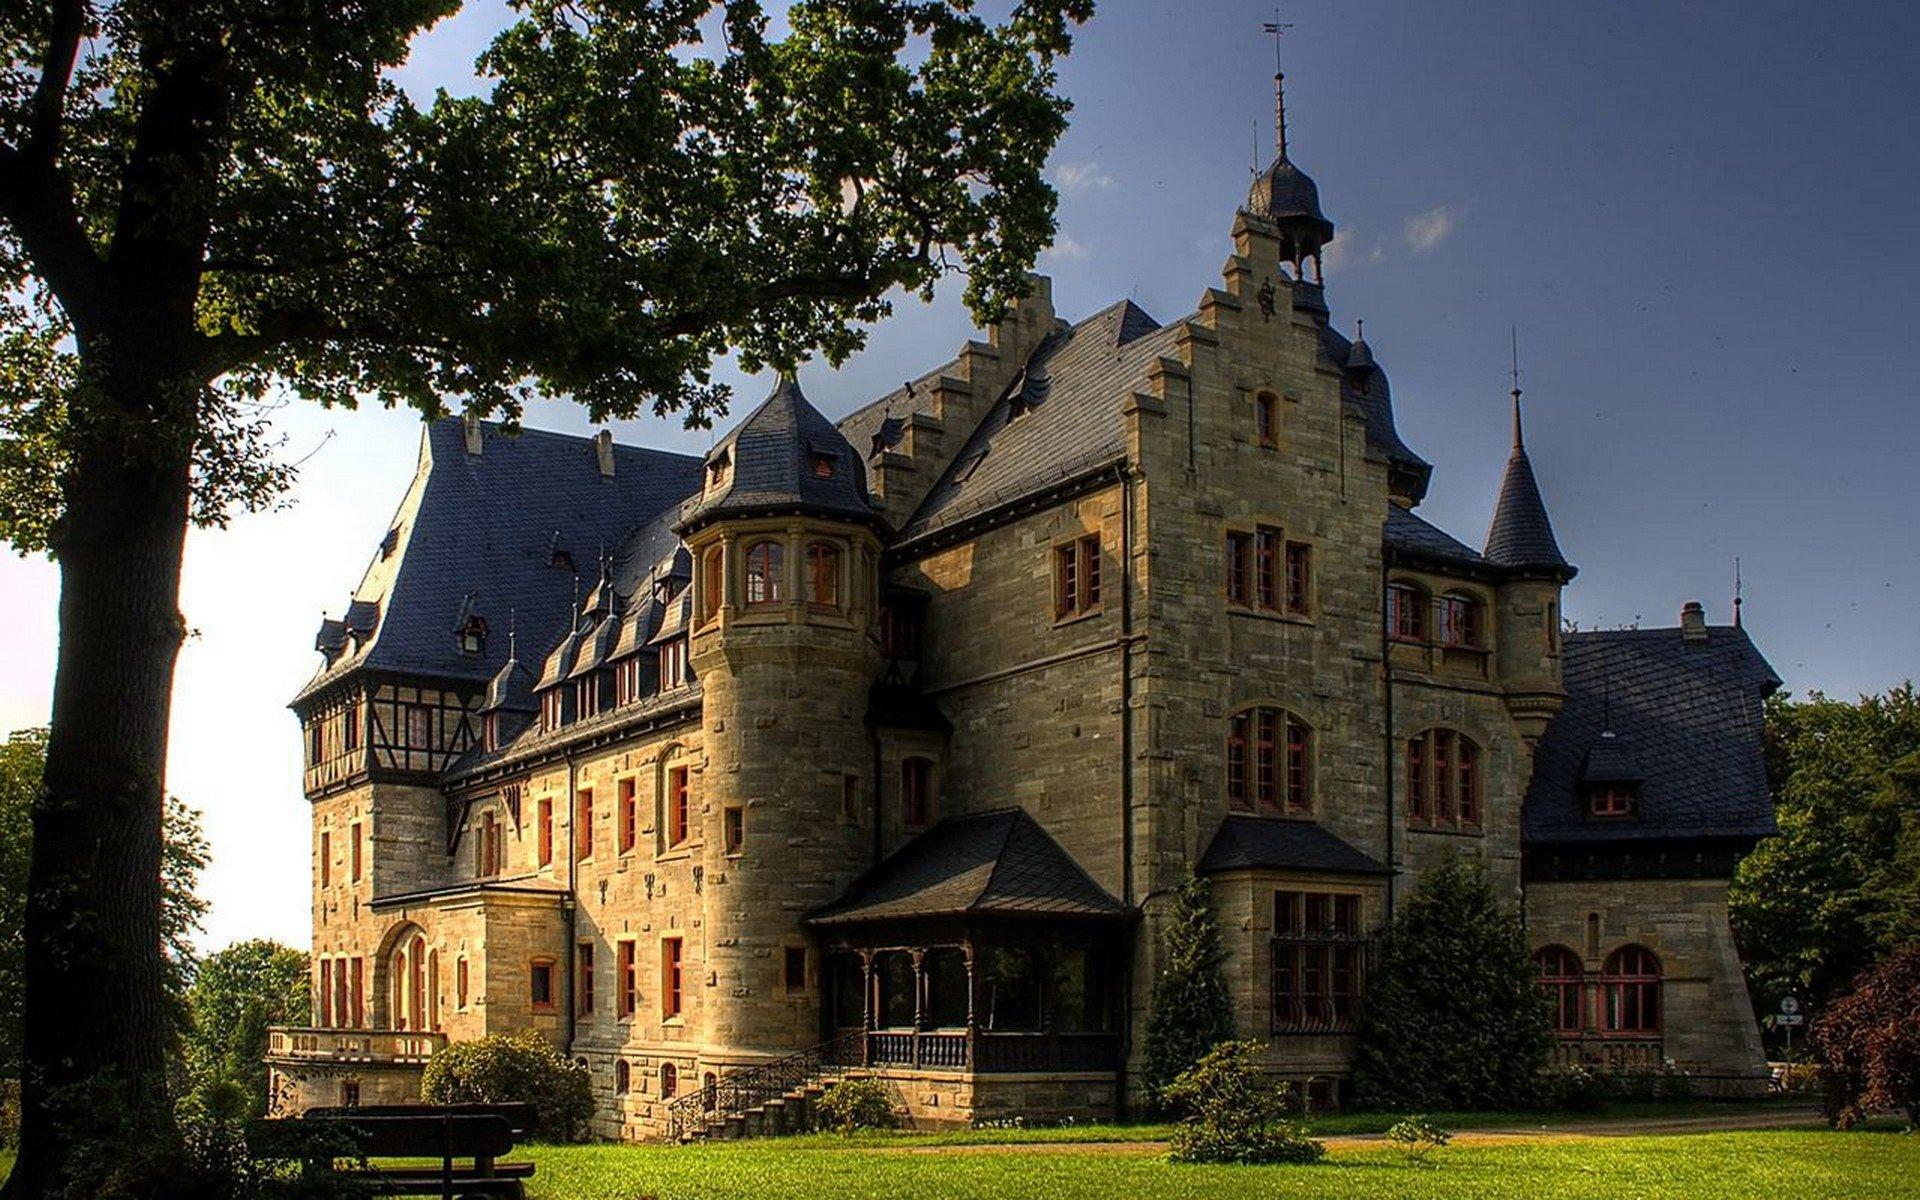 современный замок дворец фото рецептик